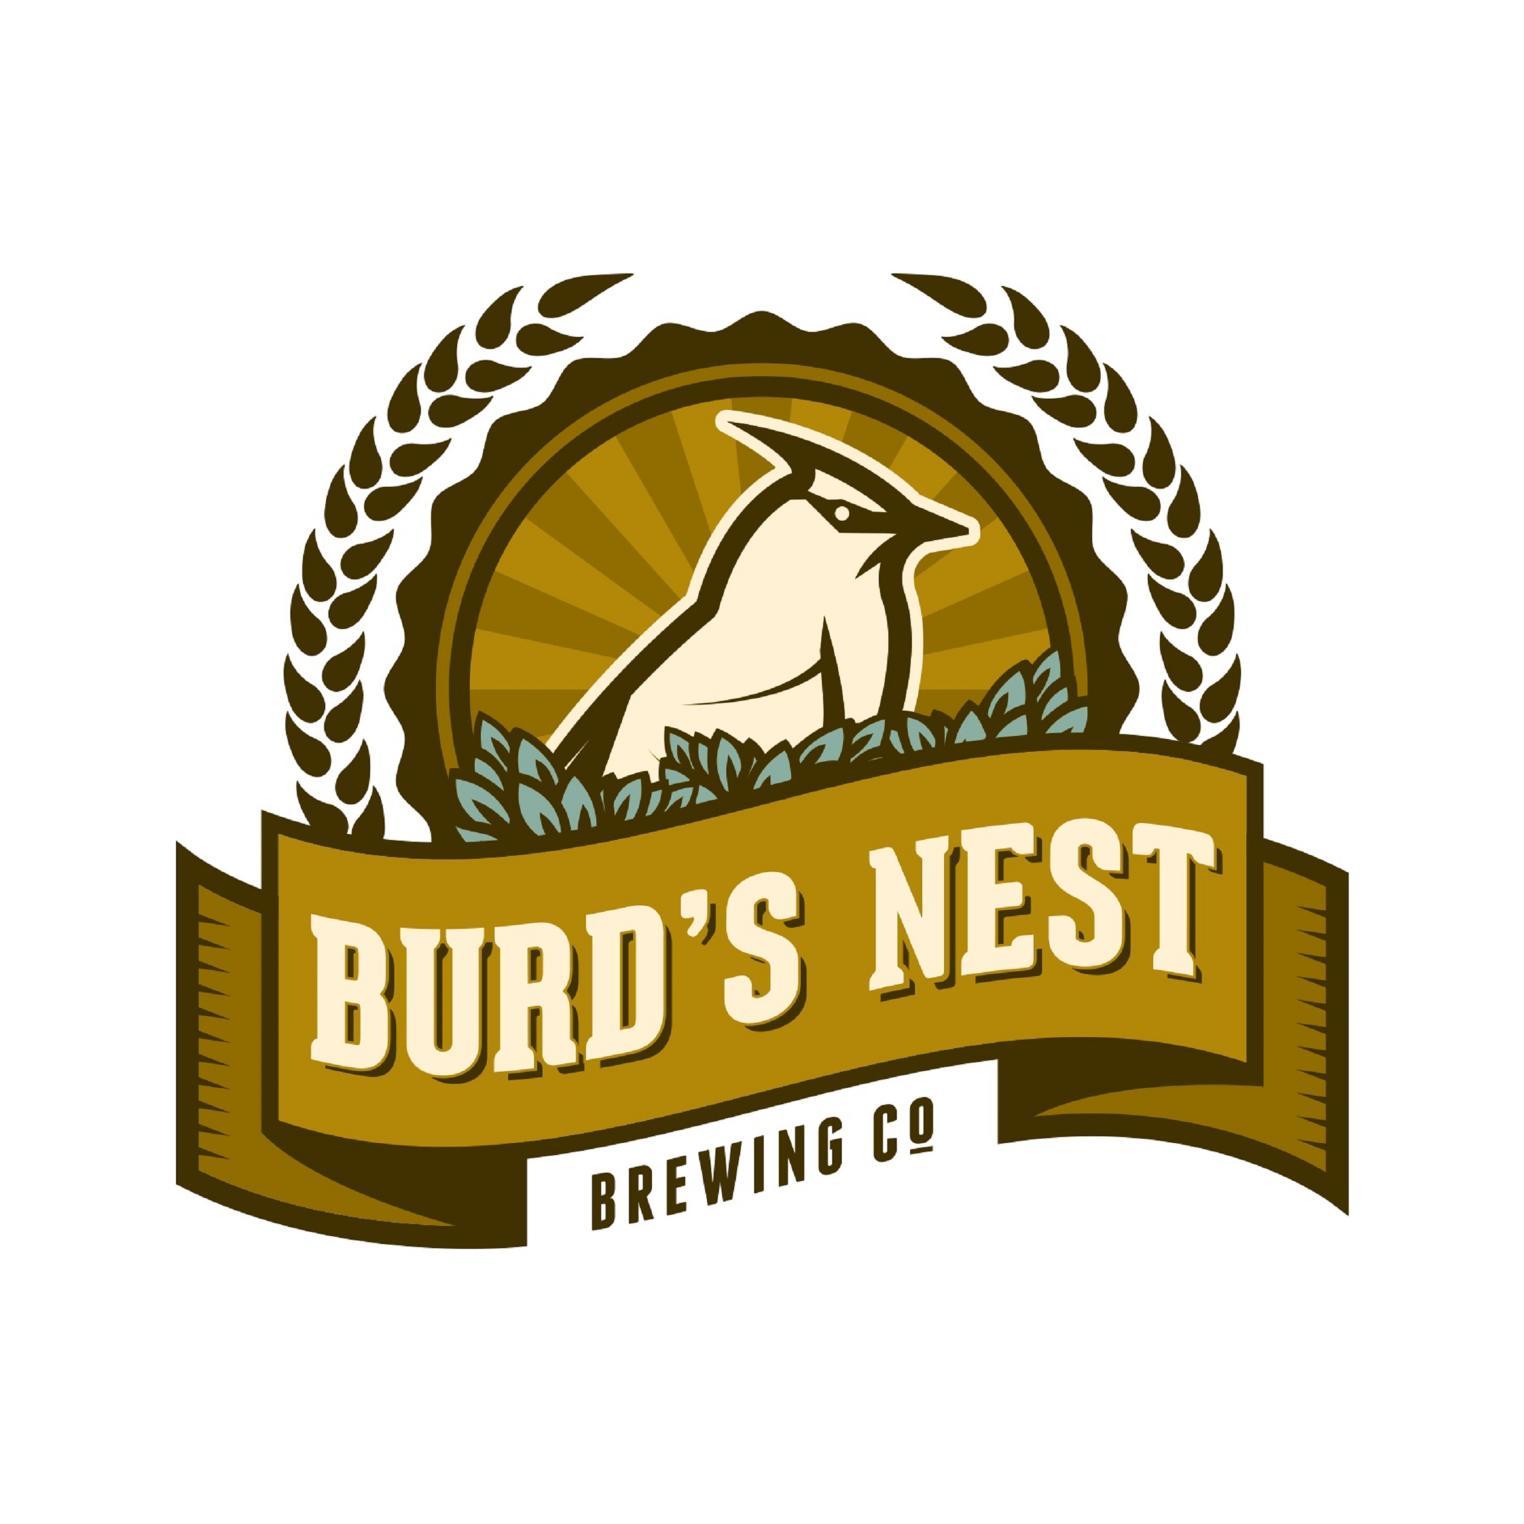 Burd's Nest Brewery